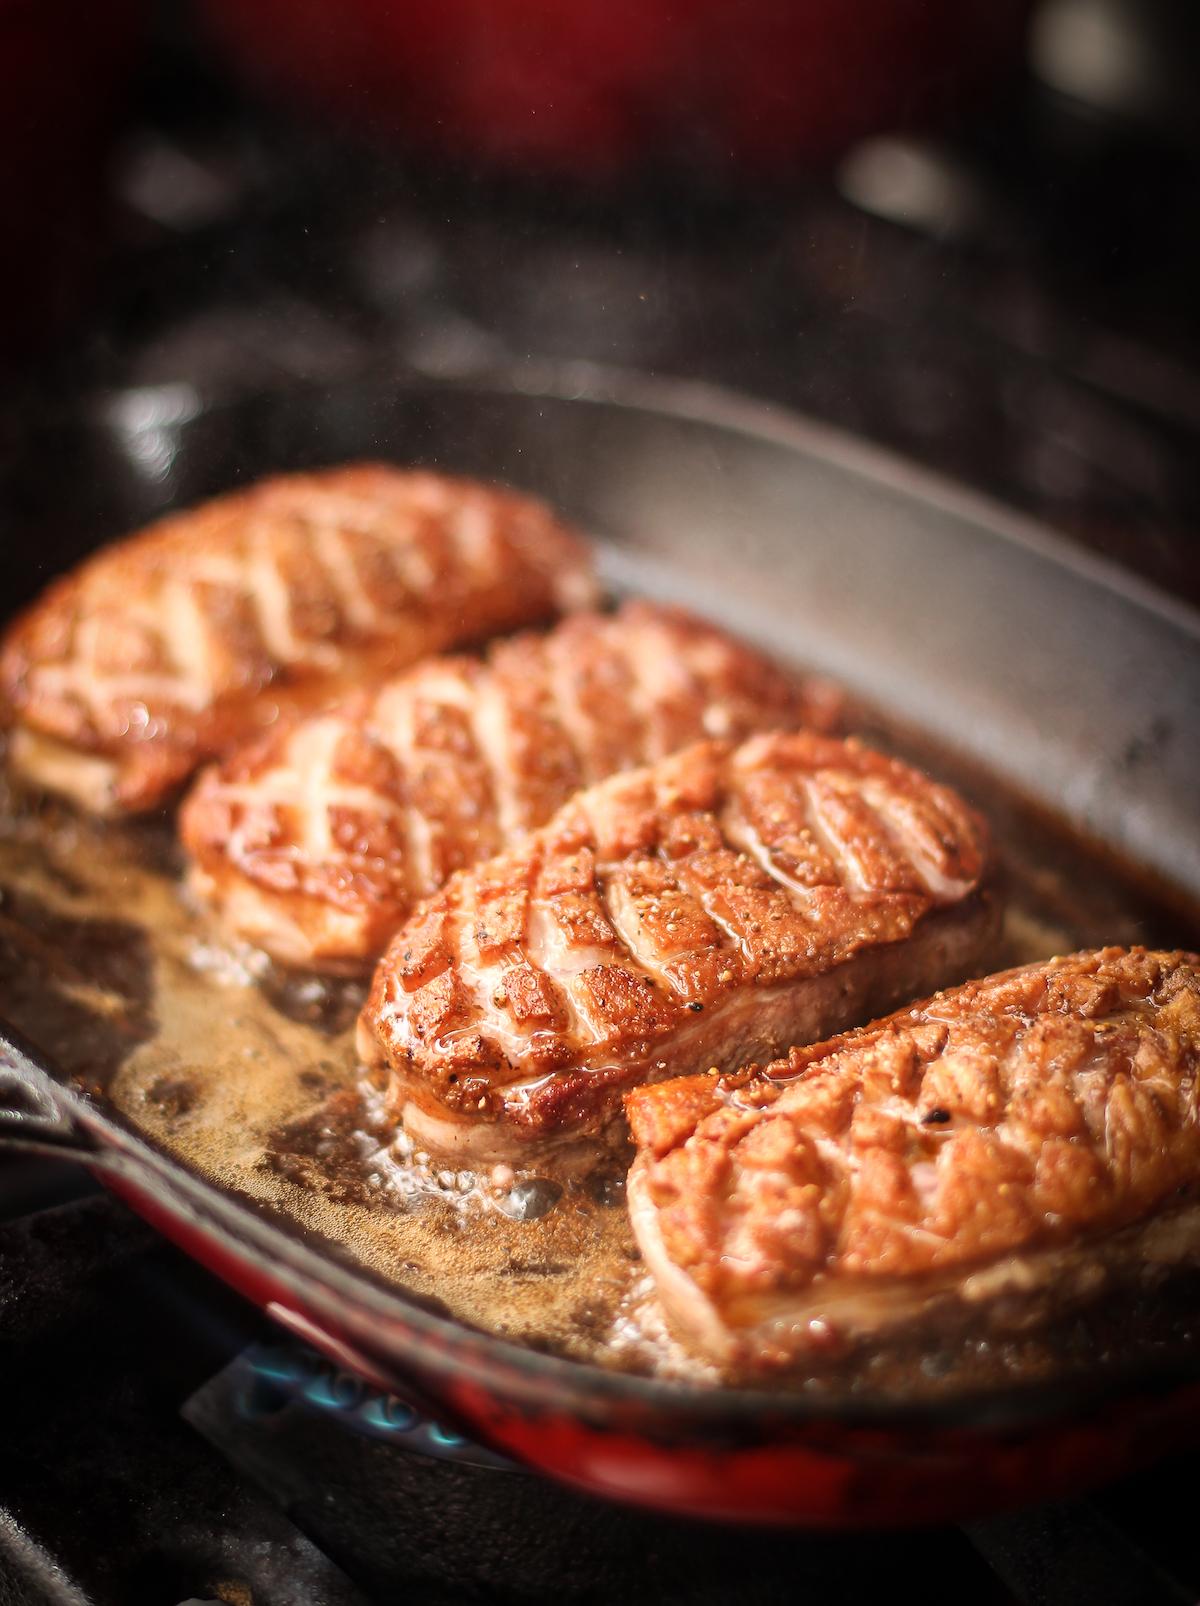 Magret en cours de cuisson ©Marcel Gussoni shutterstock